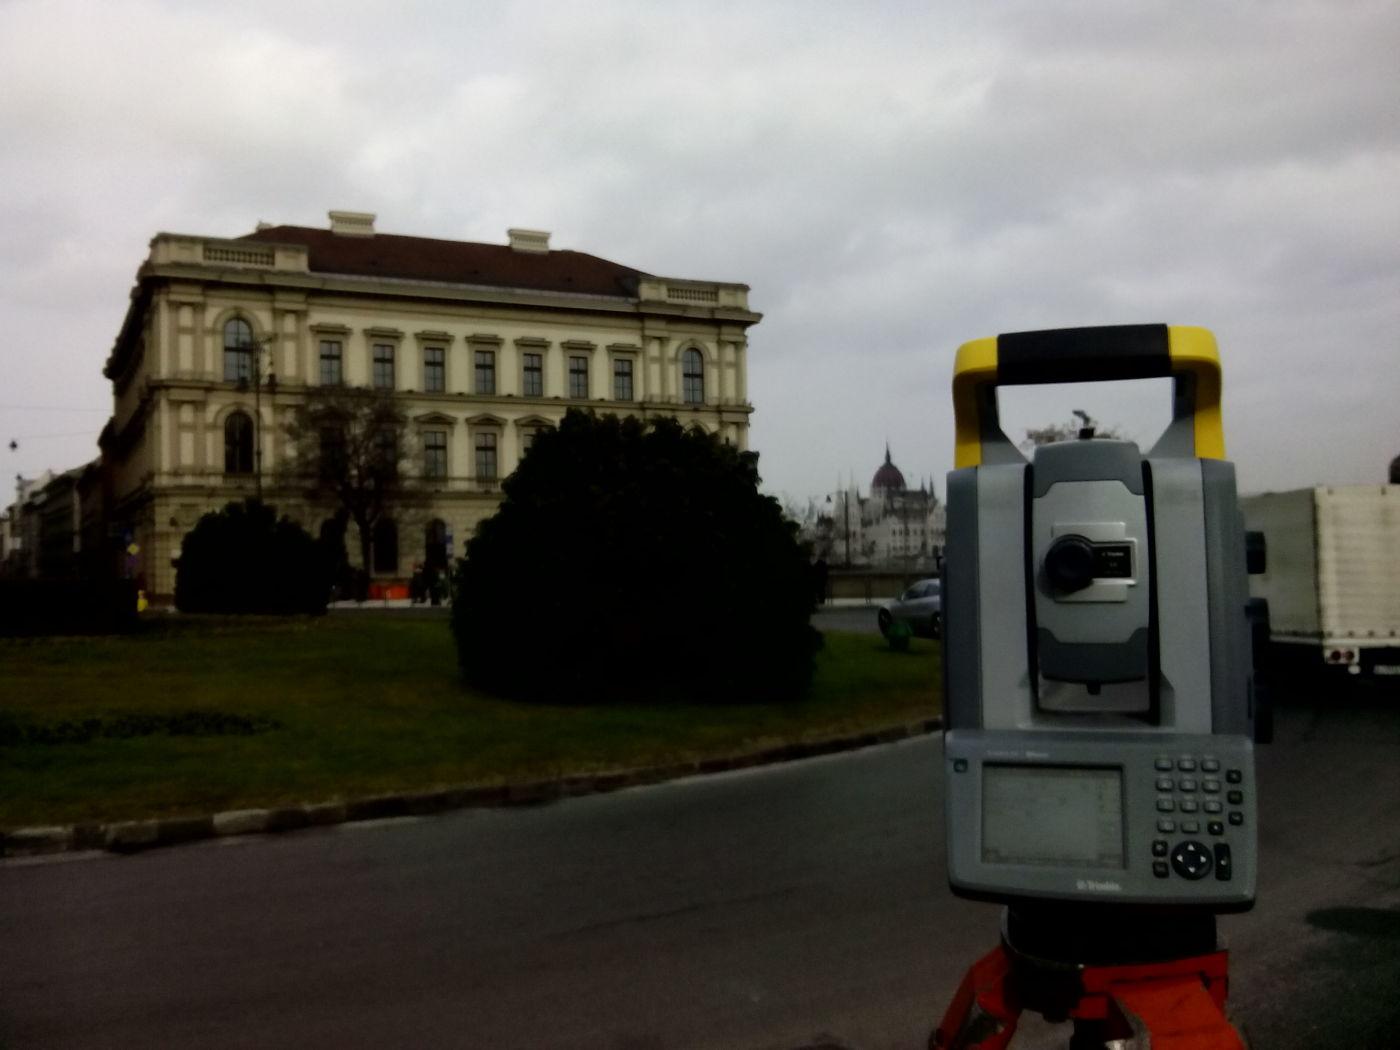 Trimble Surveying in Hungary